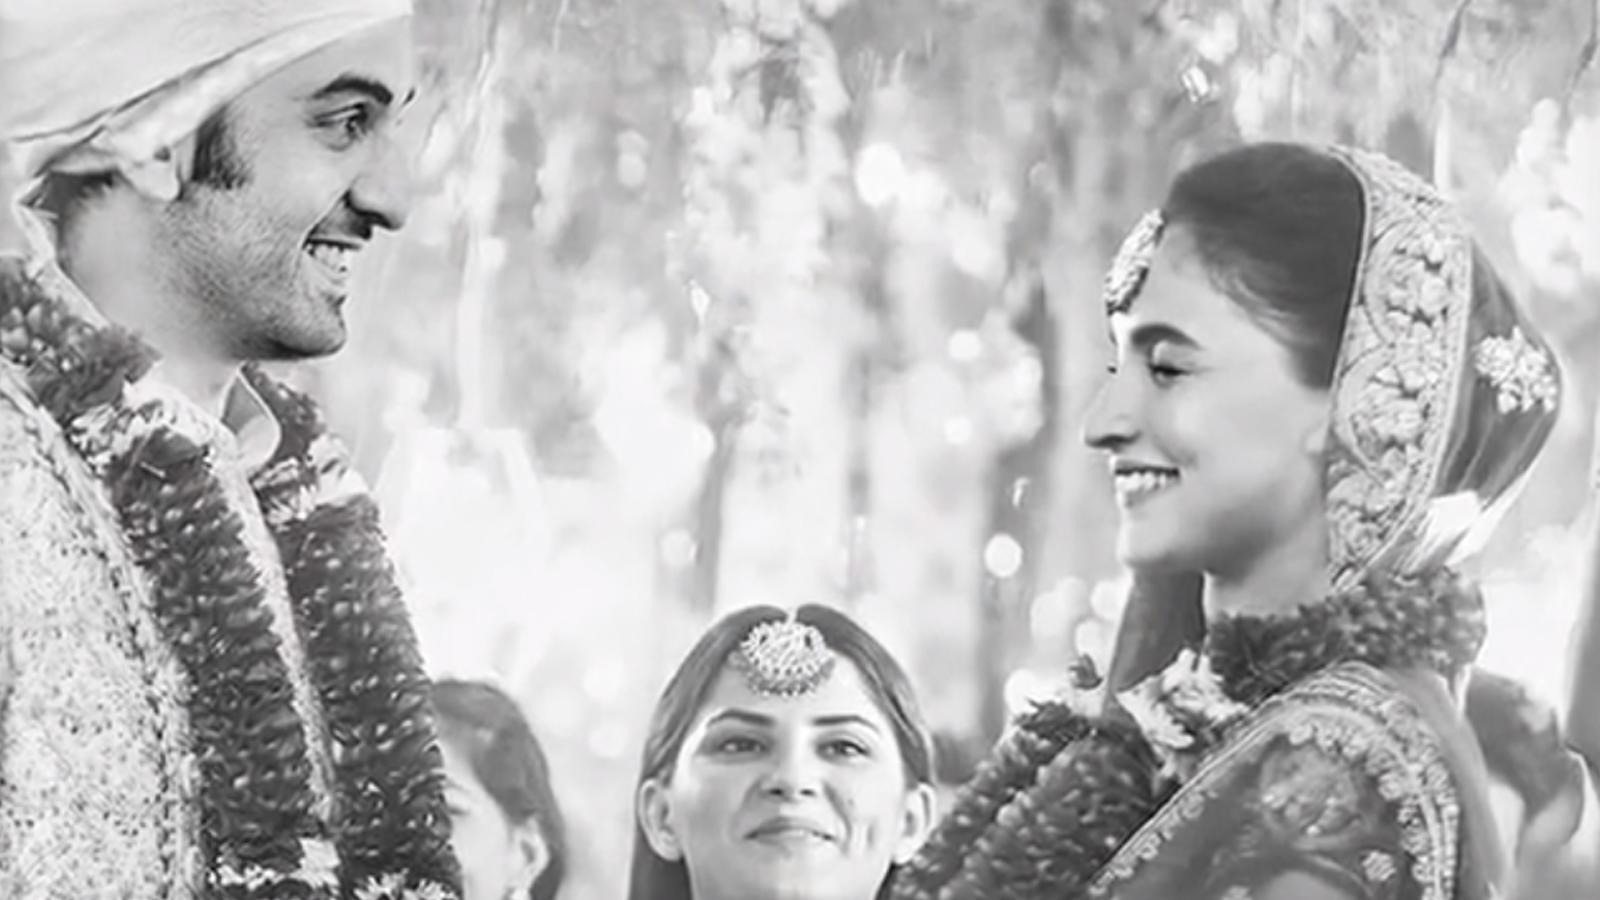 Ranbir Kapoor-Alia Bhatt's photoshopped wedding pictures go viral